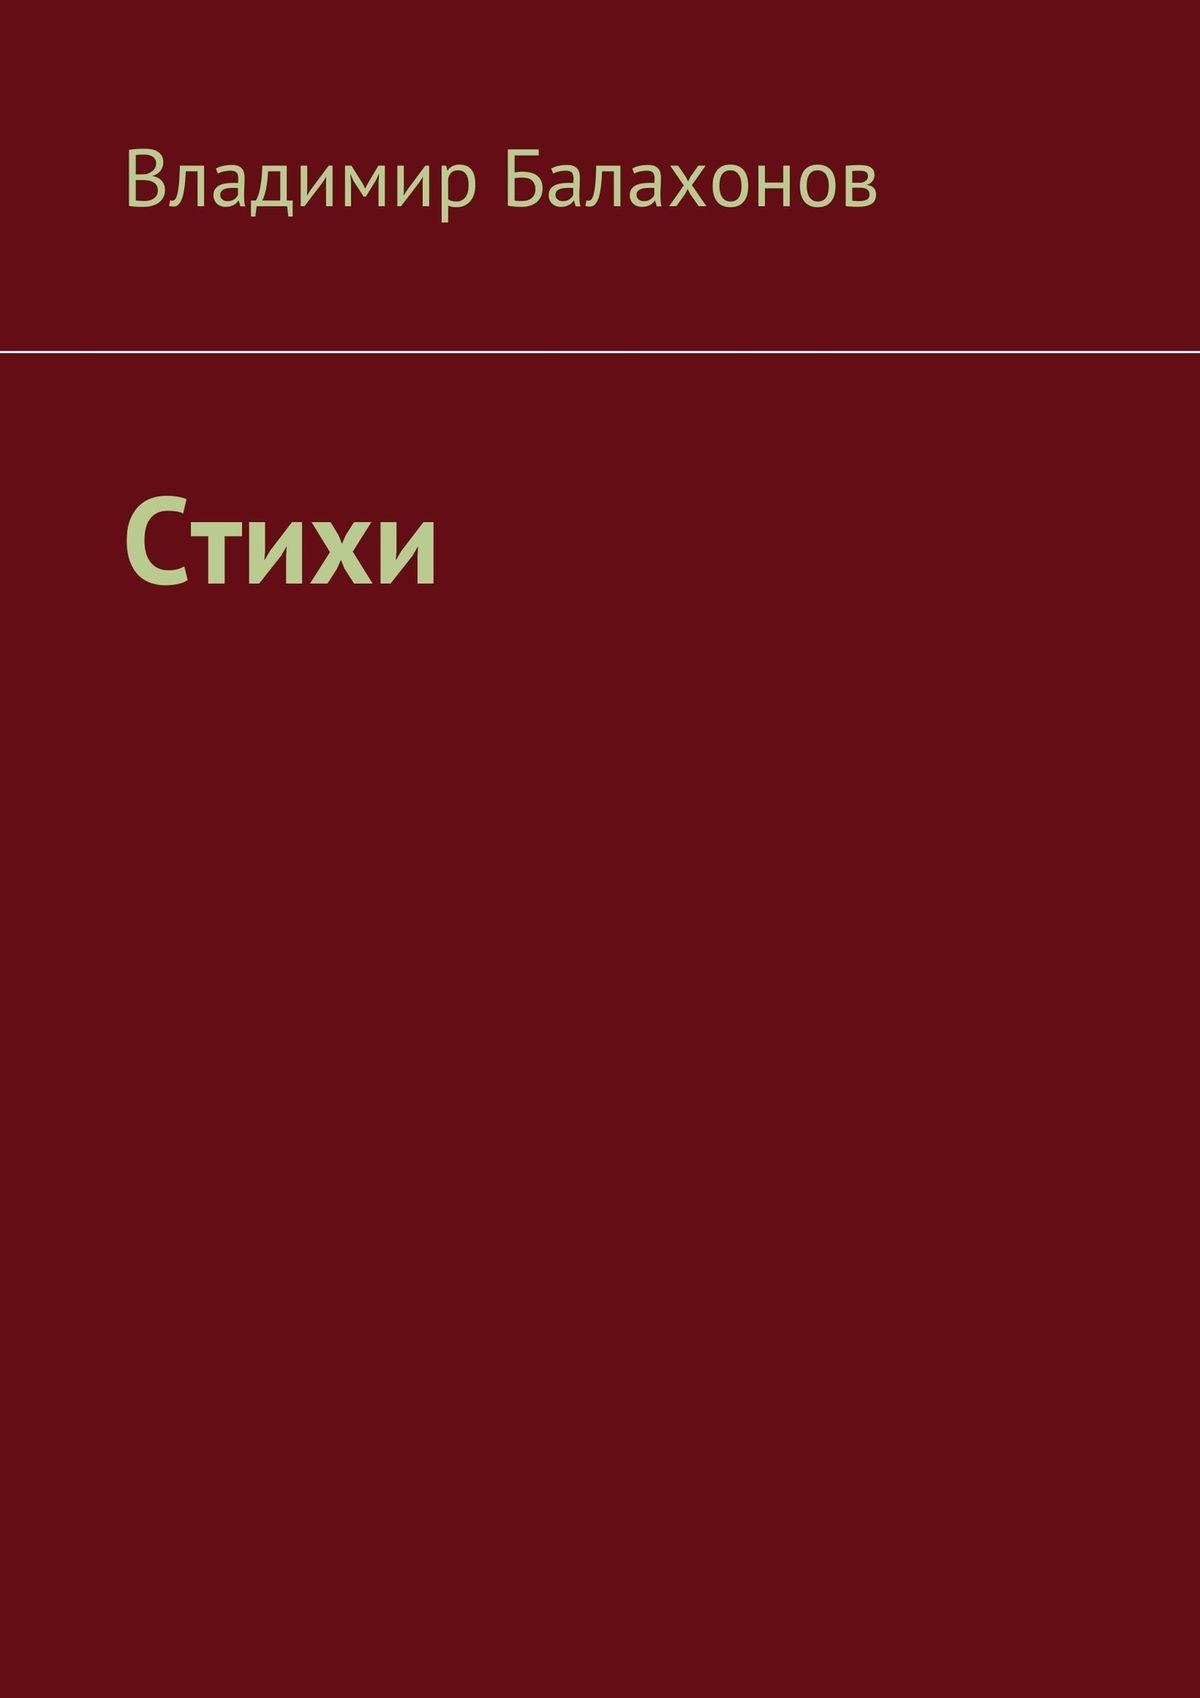 Владимир Балахонов Стихи